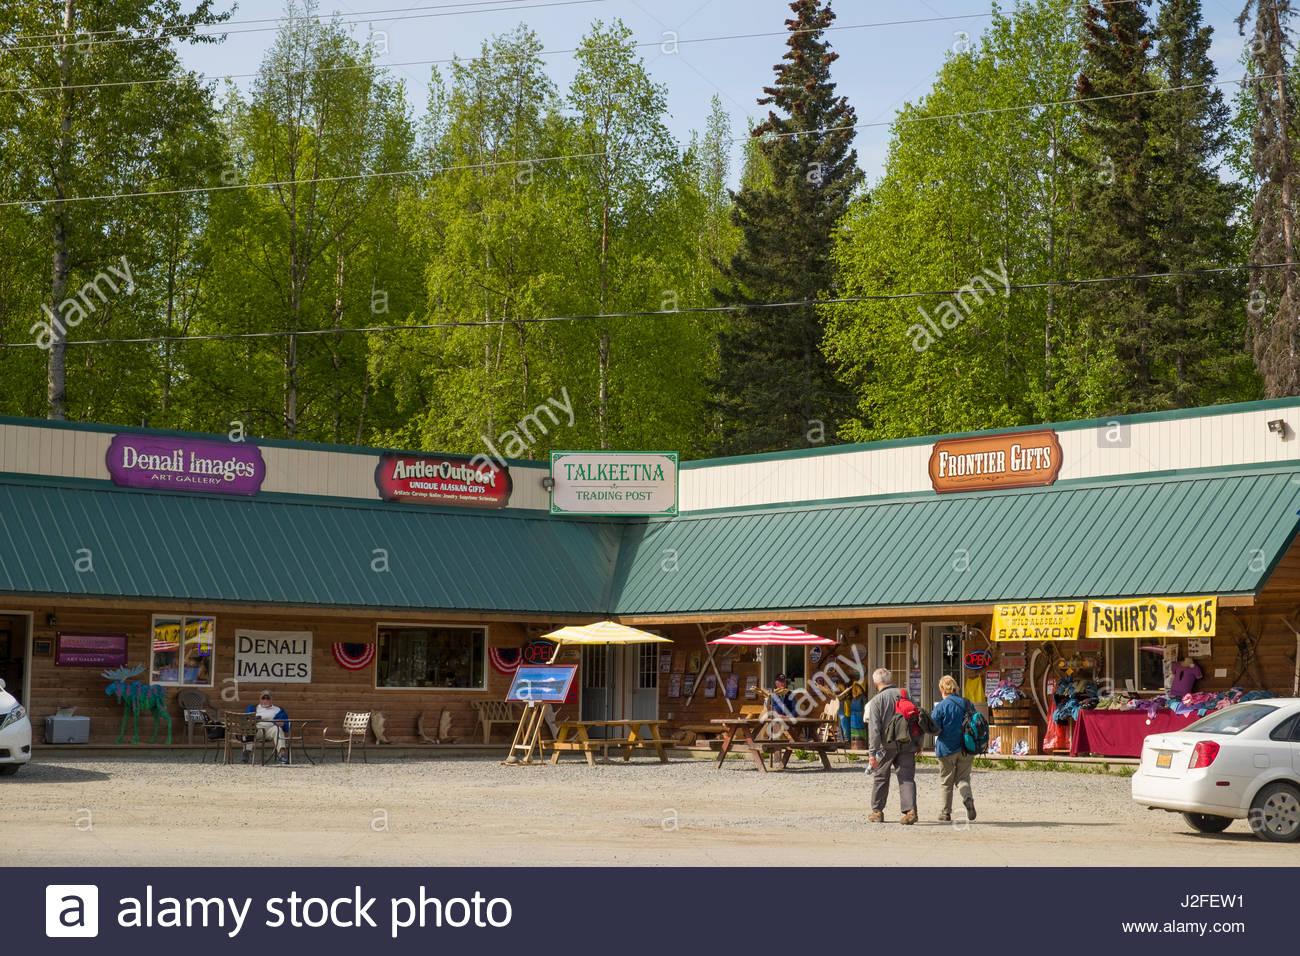 Alaska matanuska susitna county talkeetna - Shops In Strip Mall Talkeetna Matanuska Susitna Borough Alaska Usa